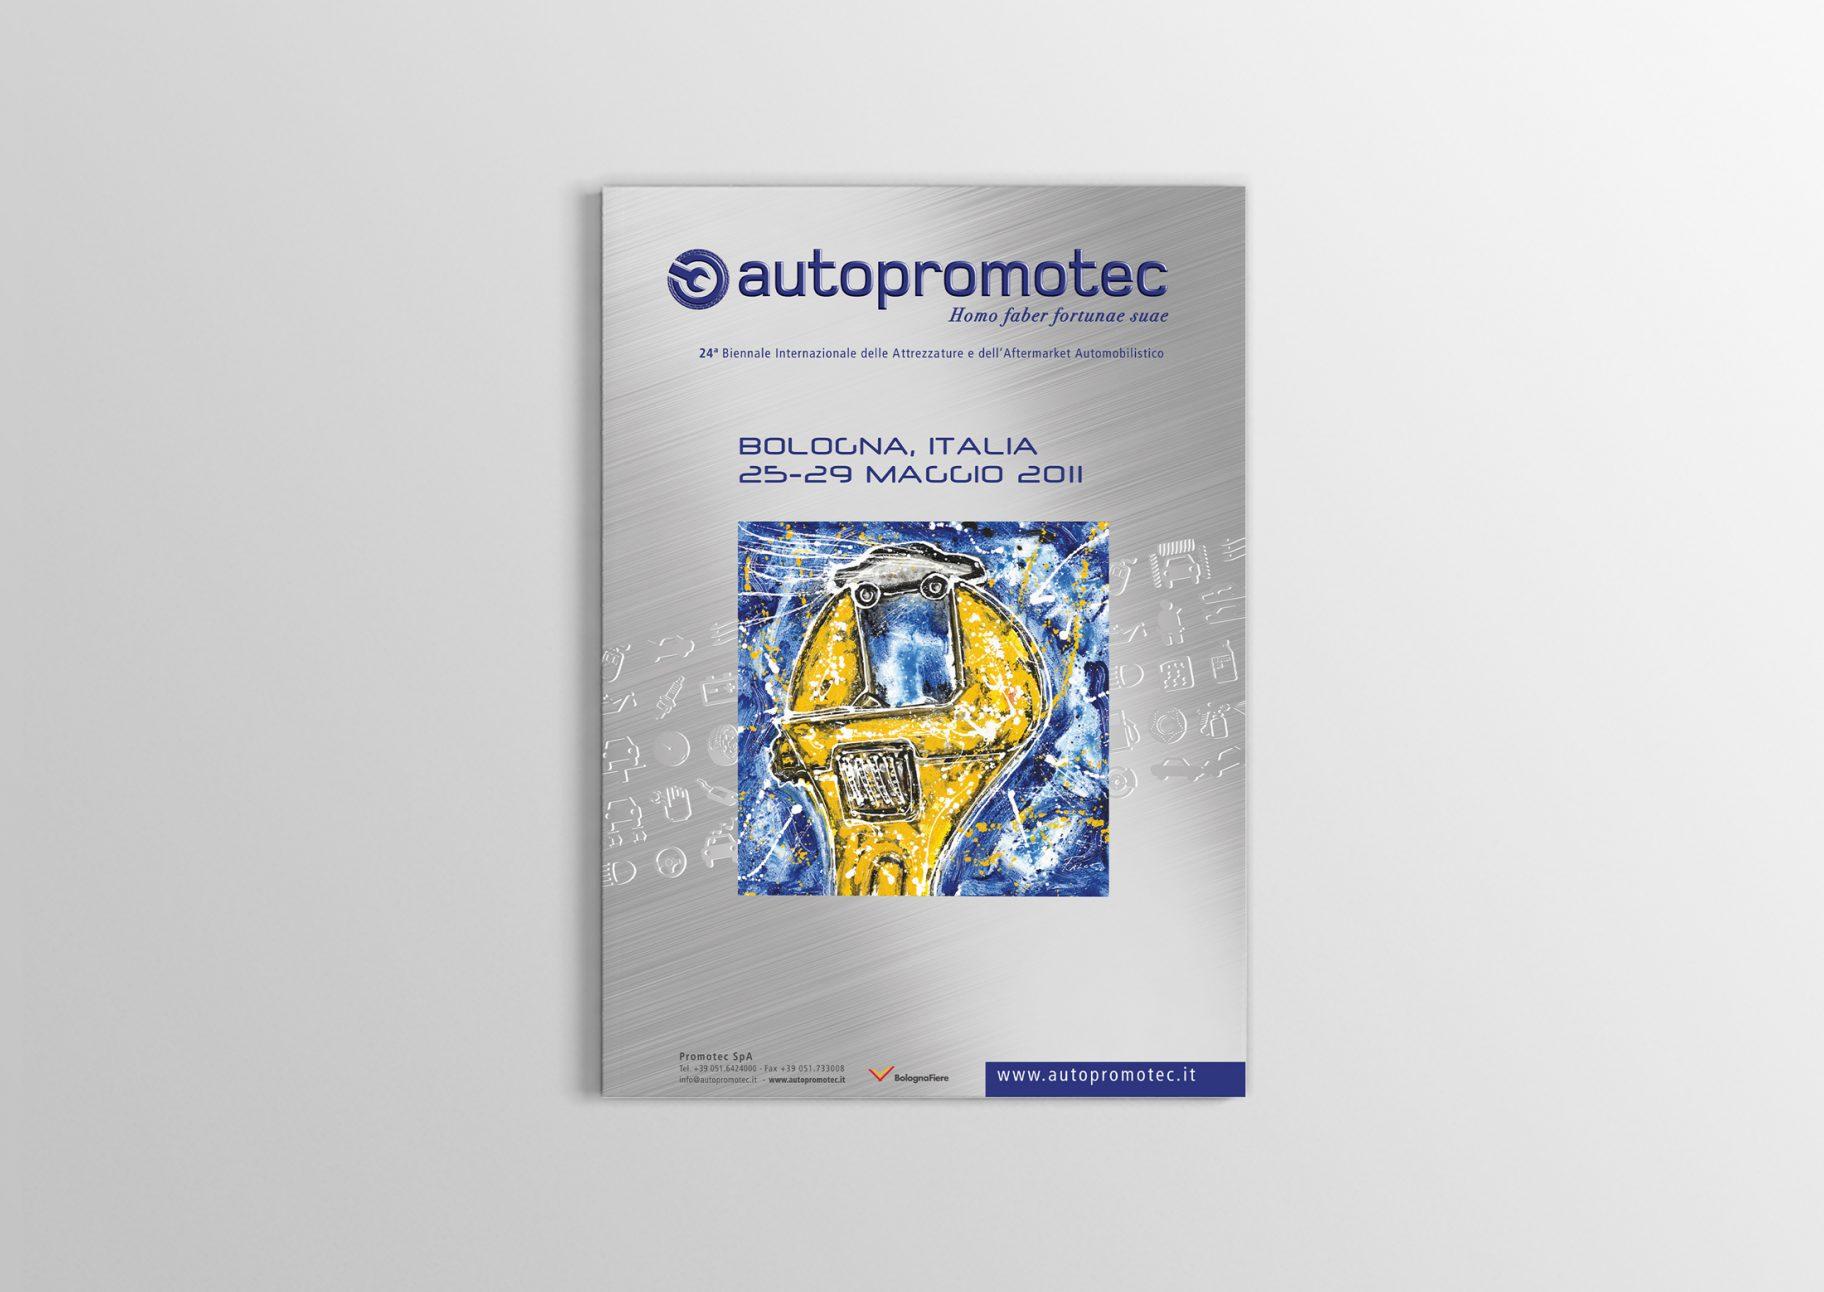 Autopromotec-fiera-2011-brochure-copertina